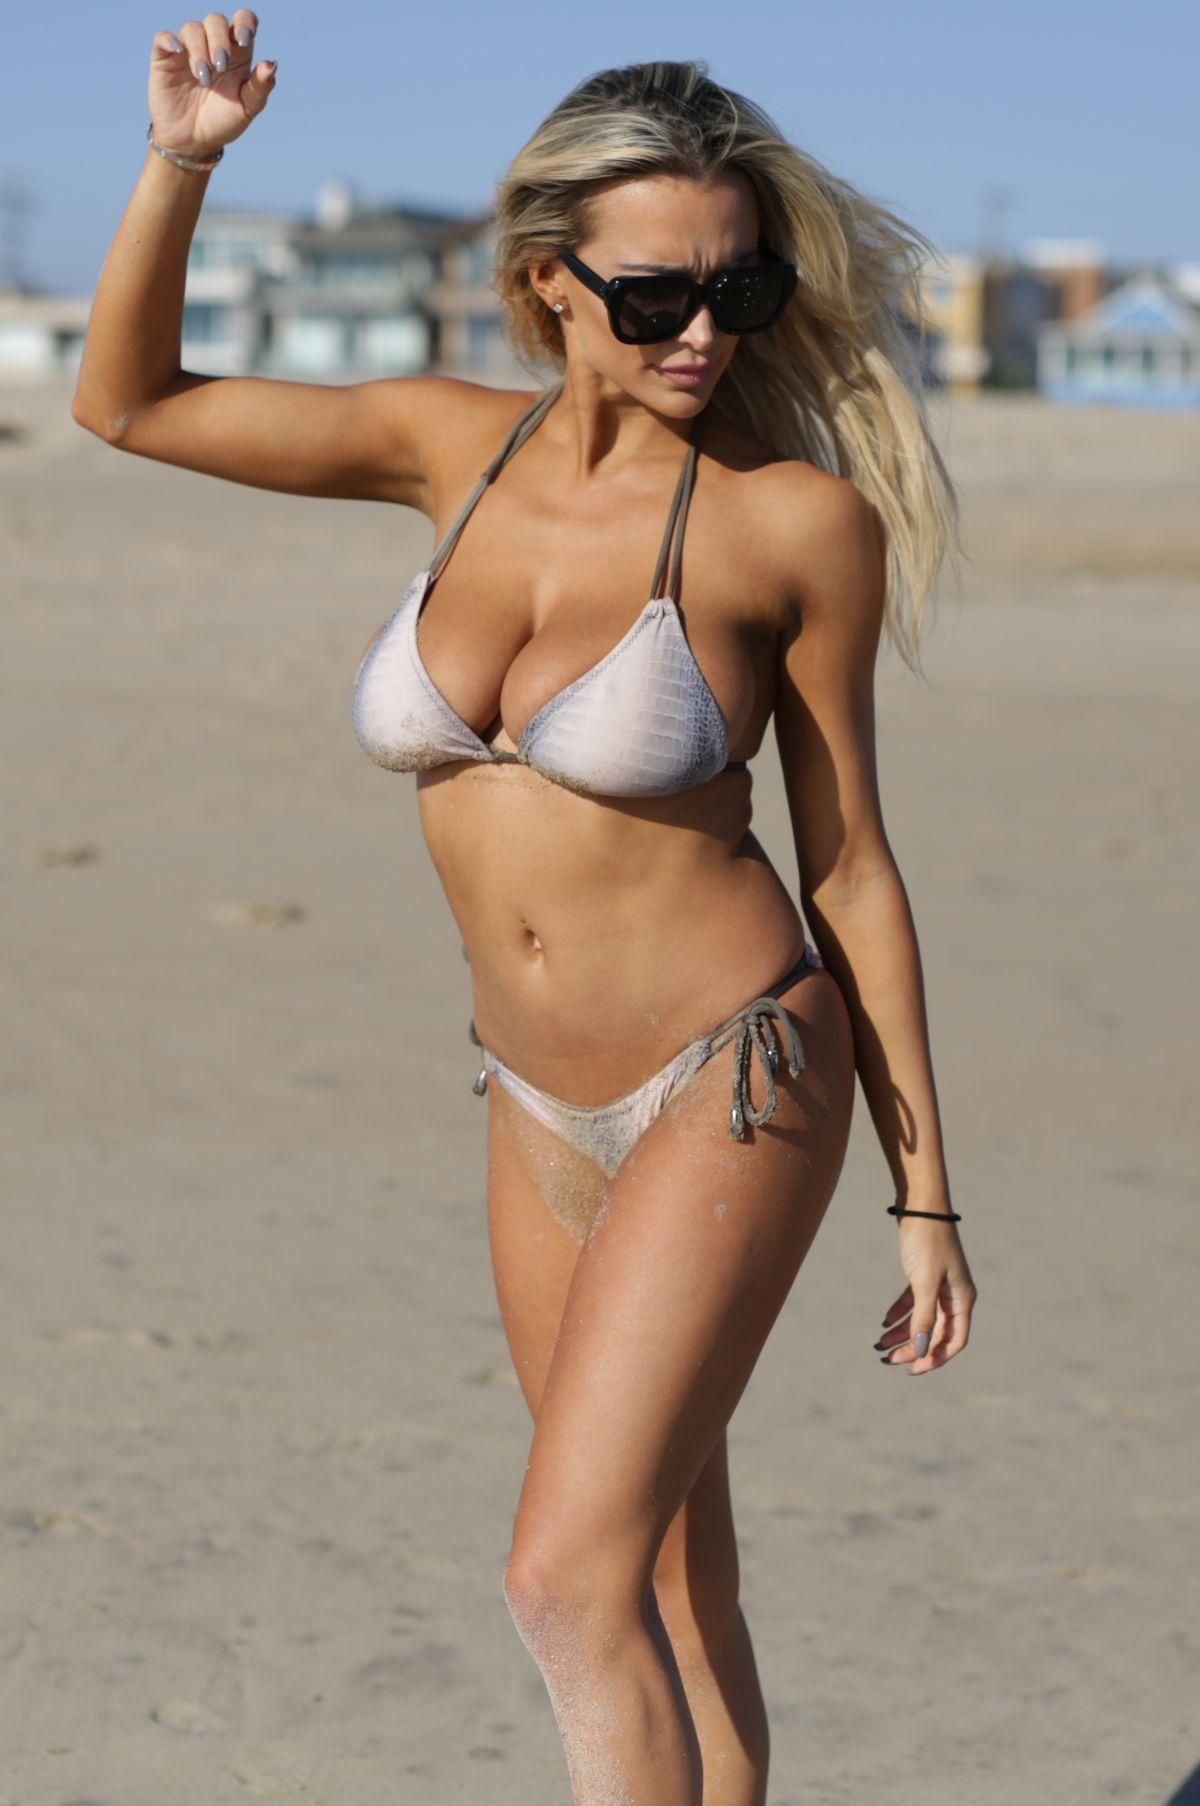 Lindsey pelas in bikini 7 Photos